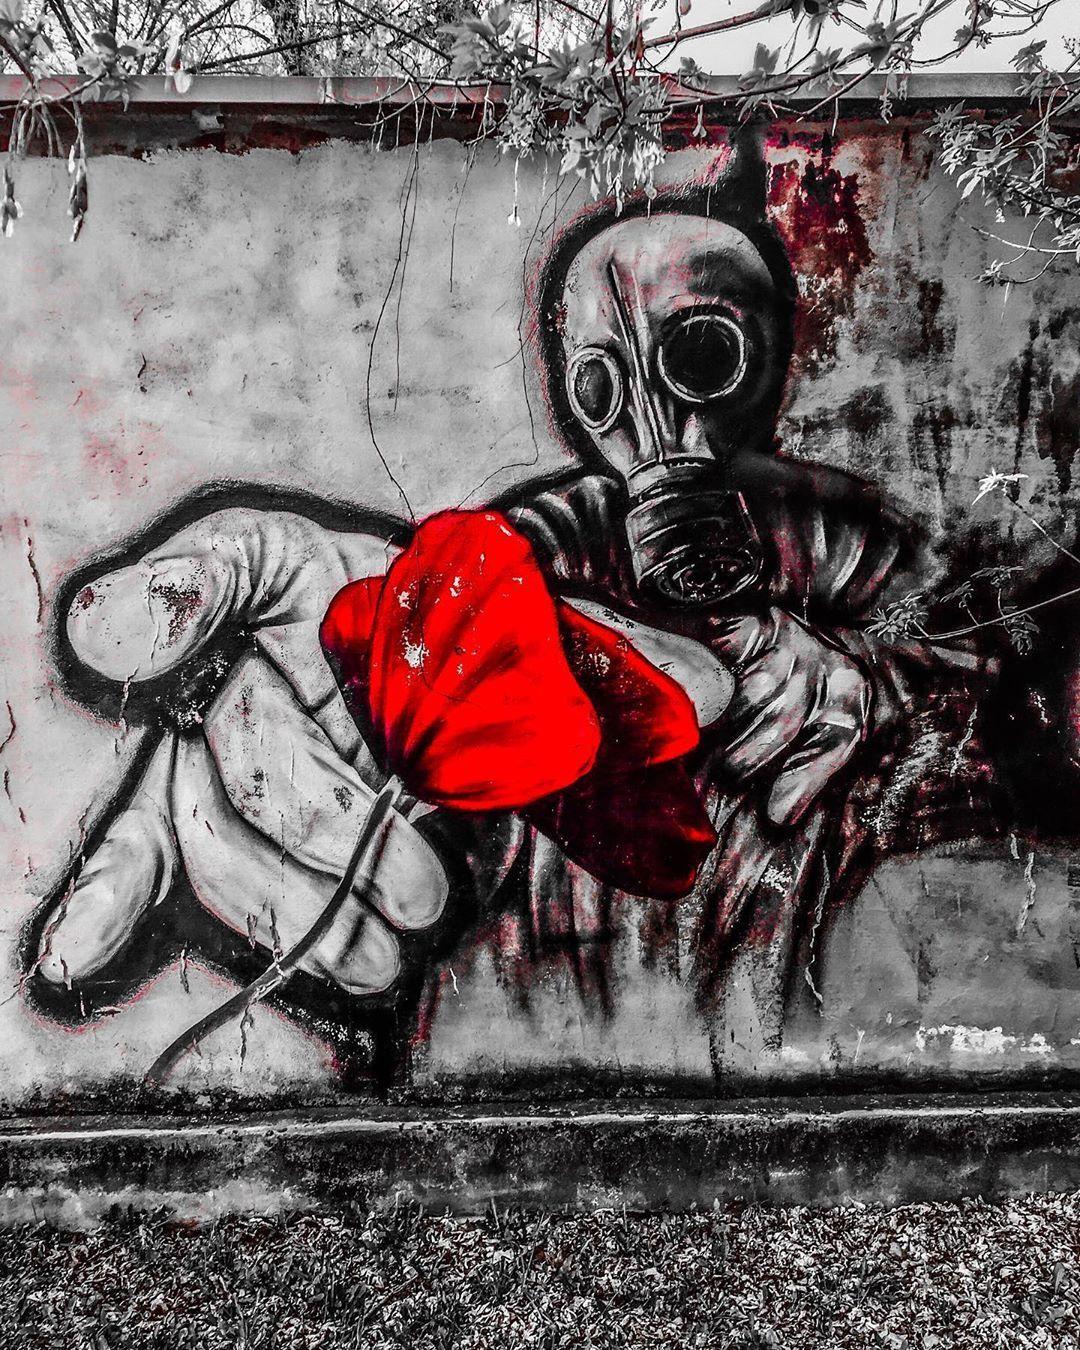 +20 #paintingnails #paintingfromlife #drawingcontest #drawingforfun #drawingday #streetartworldwide #graffitibrasil #paintingisfun #wallington #drawing #murallas #paintingshoes #streetartistanbul #drawingtablet #graffitigers #muralha #paintinglife #drawingismylife #graffitimadrid #drawingonpaper #paintingwarhammer40k #drawingprocess #paintingvideo #drawing #graffitibcn #paintingflowers #painting_forever_art #drawingink #graffitiwriters #graffitihunter